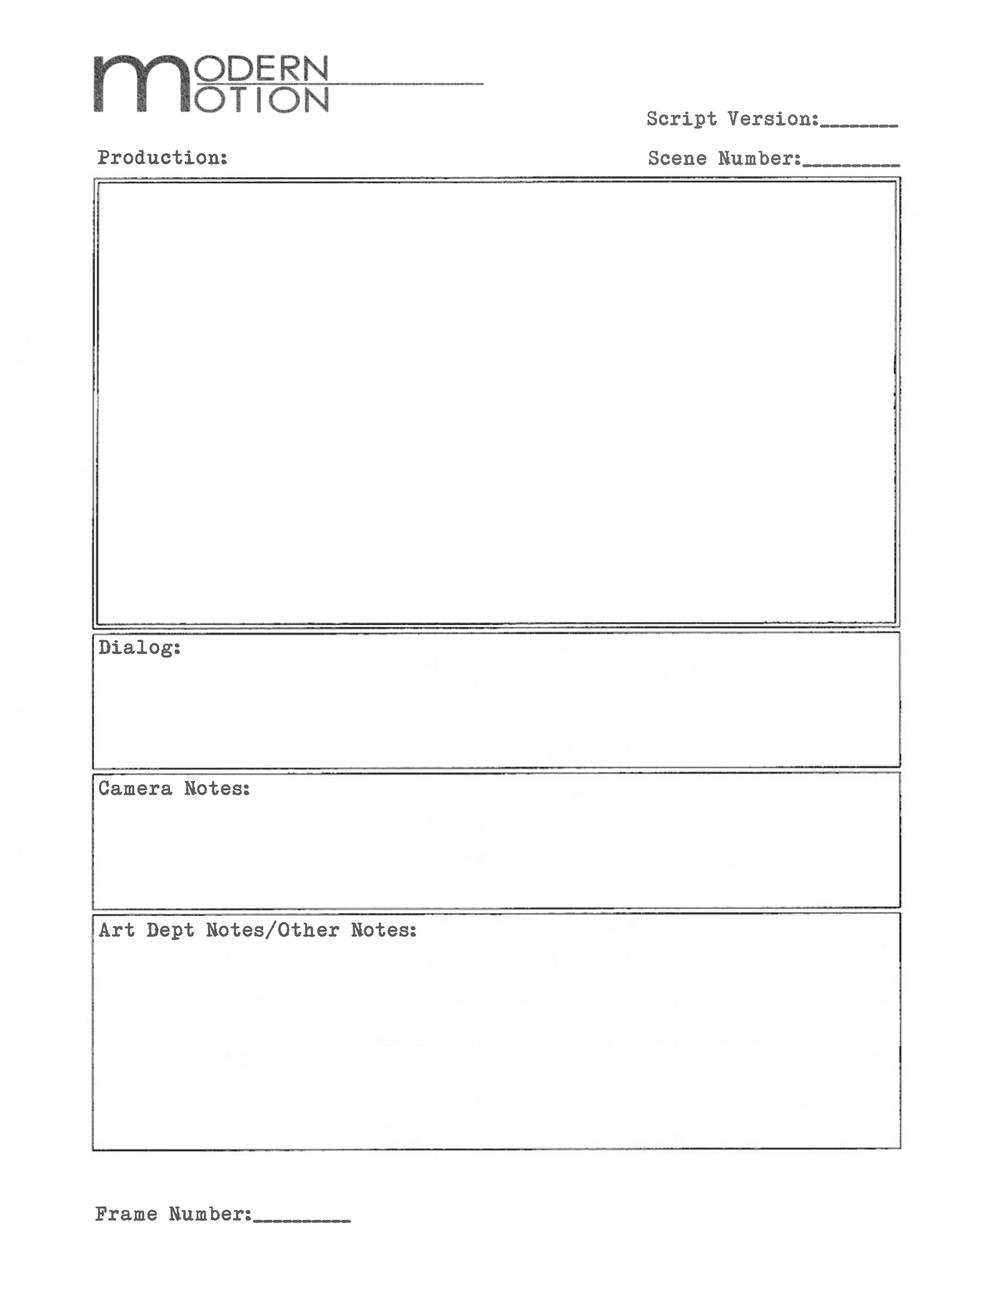 Modern-Motion-Blank-Story-Board.png